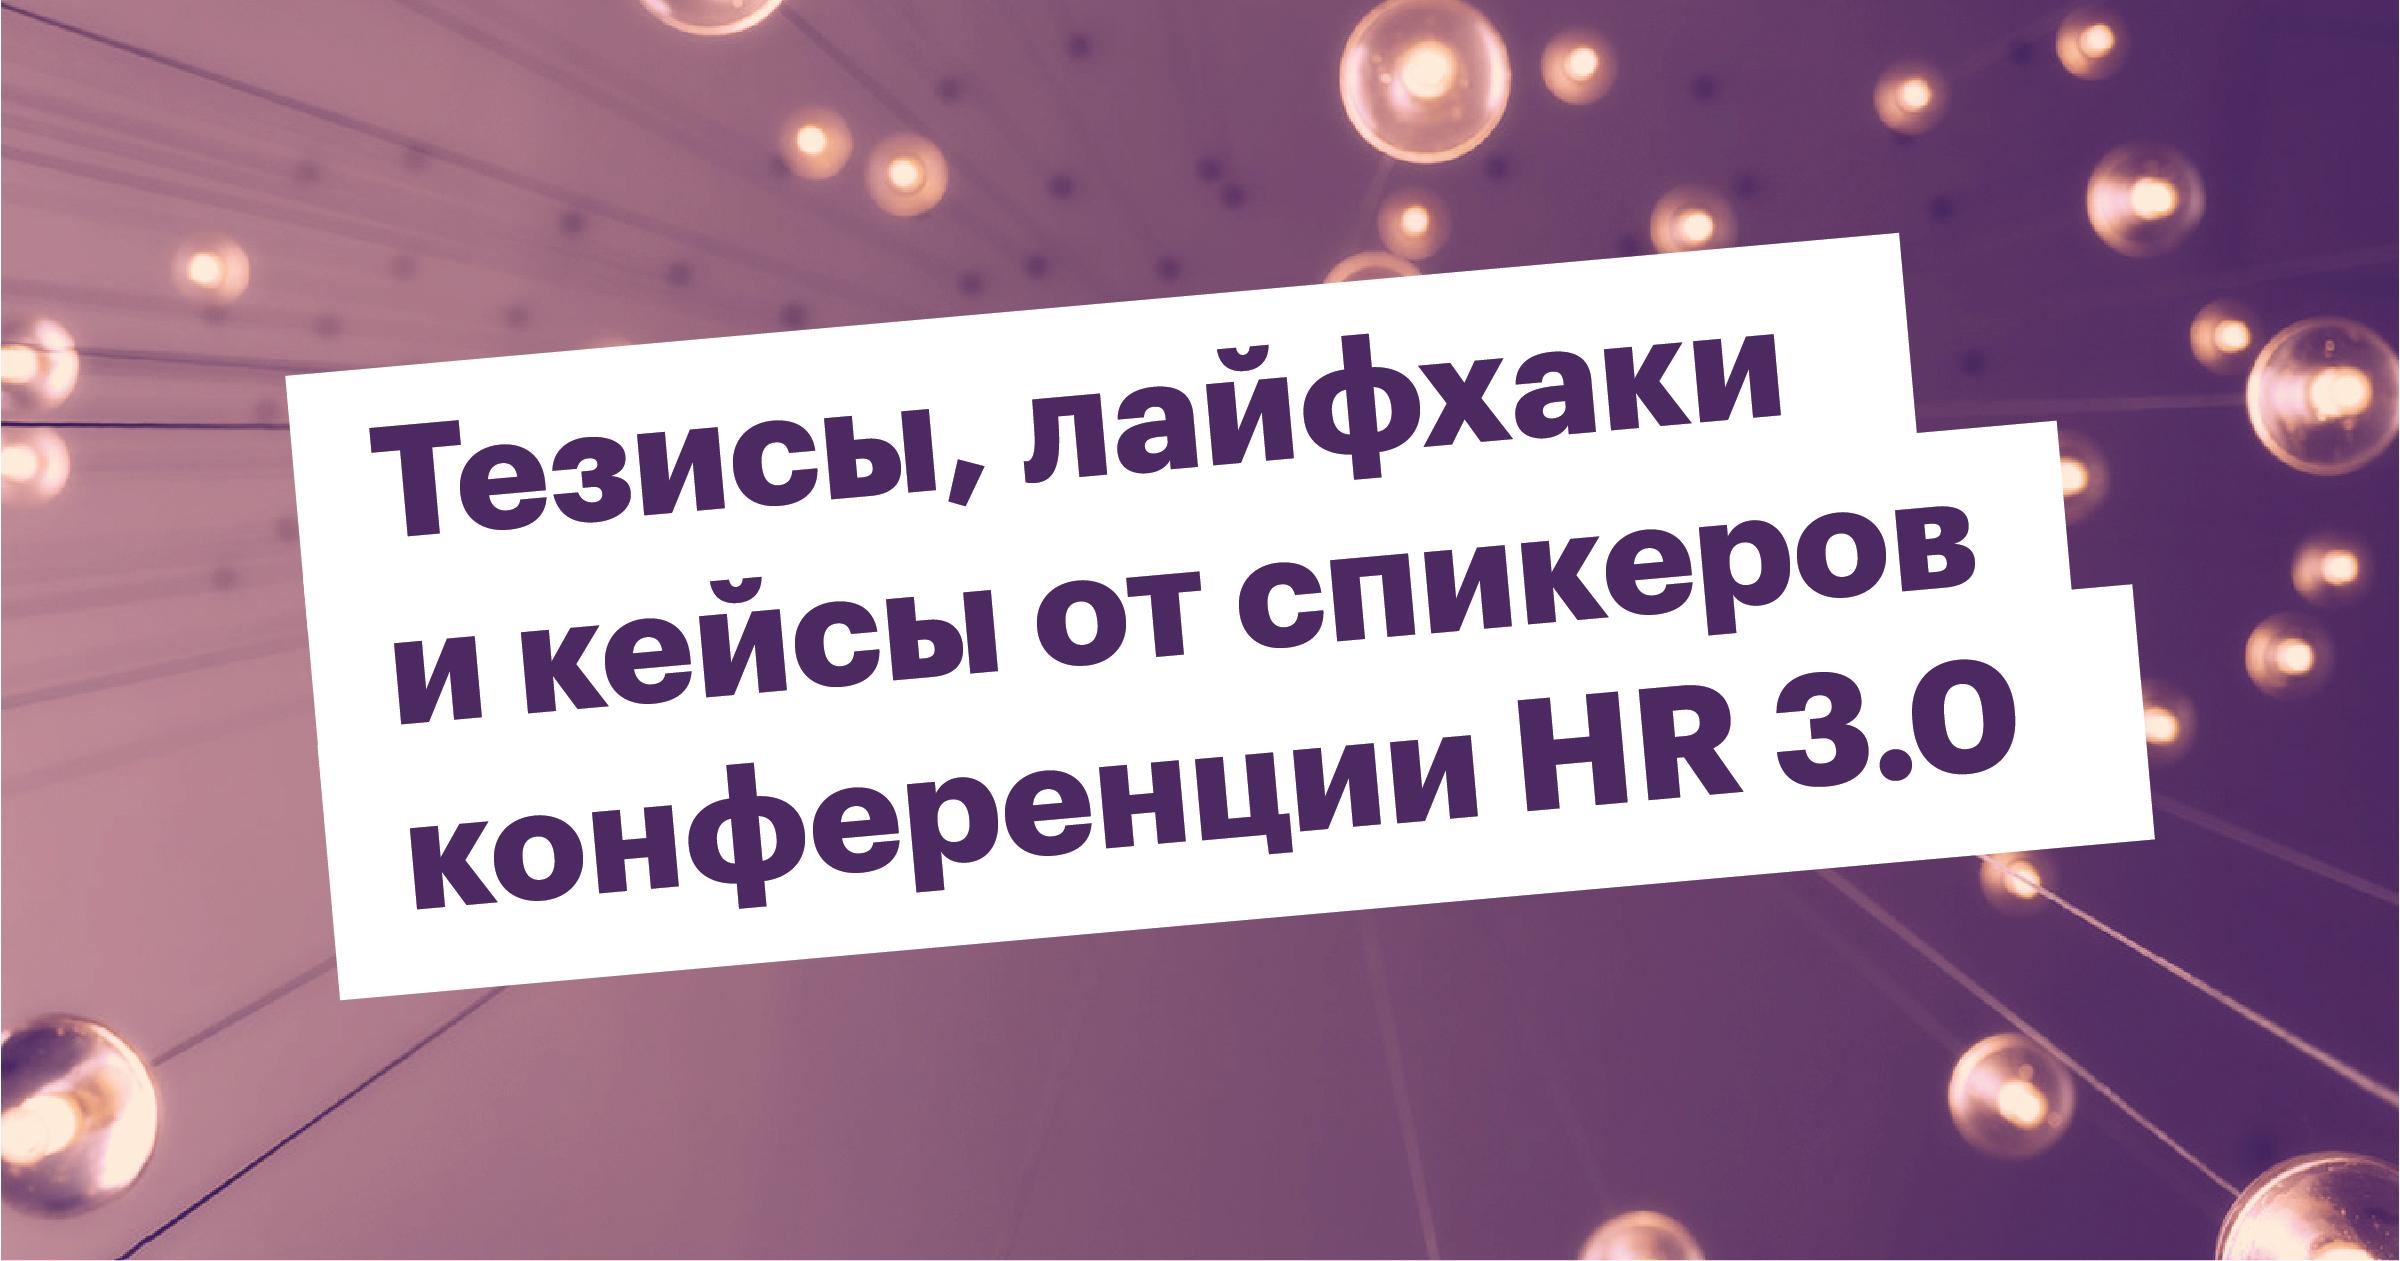 Конспект конференции HR 3.0